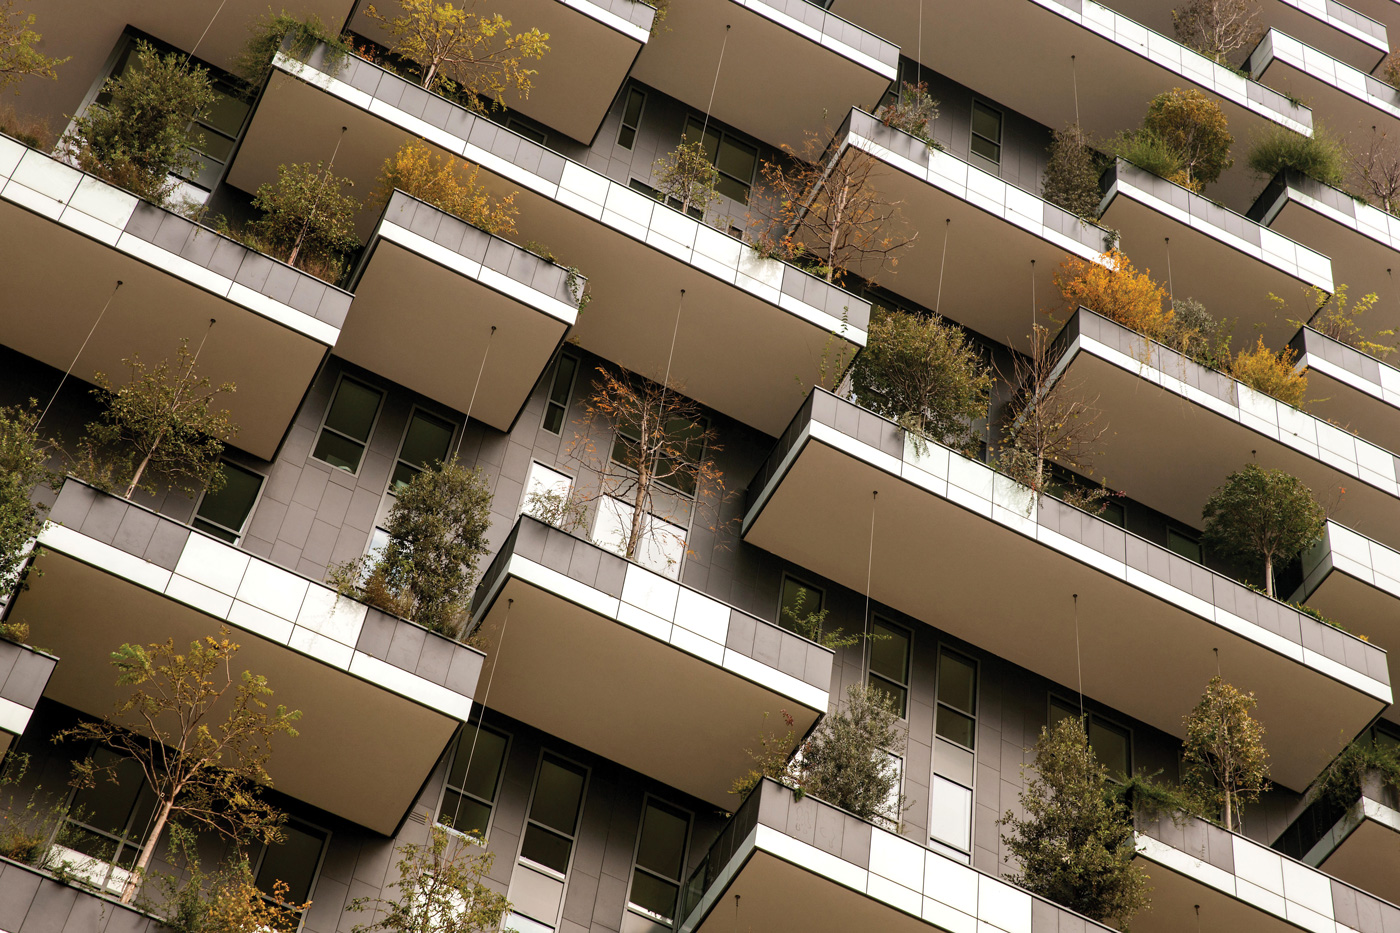 Picture of Stefano Boeri's Bosco Verticale in Milan